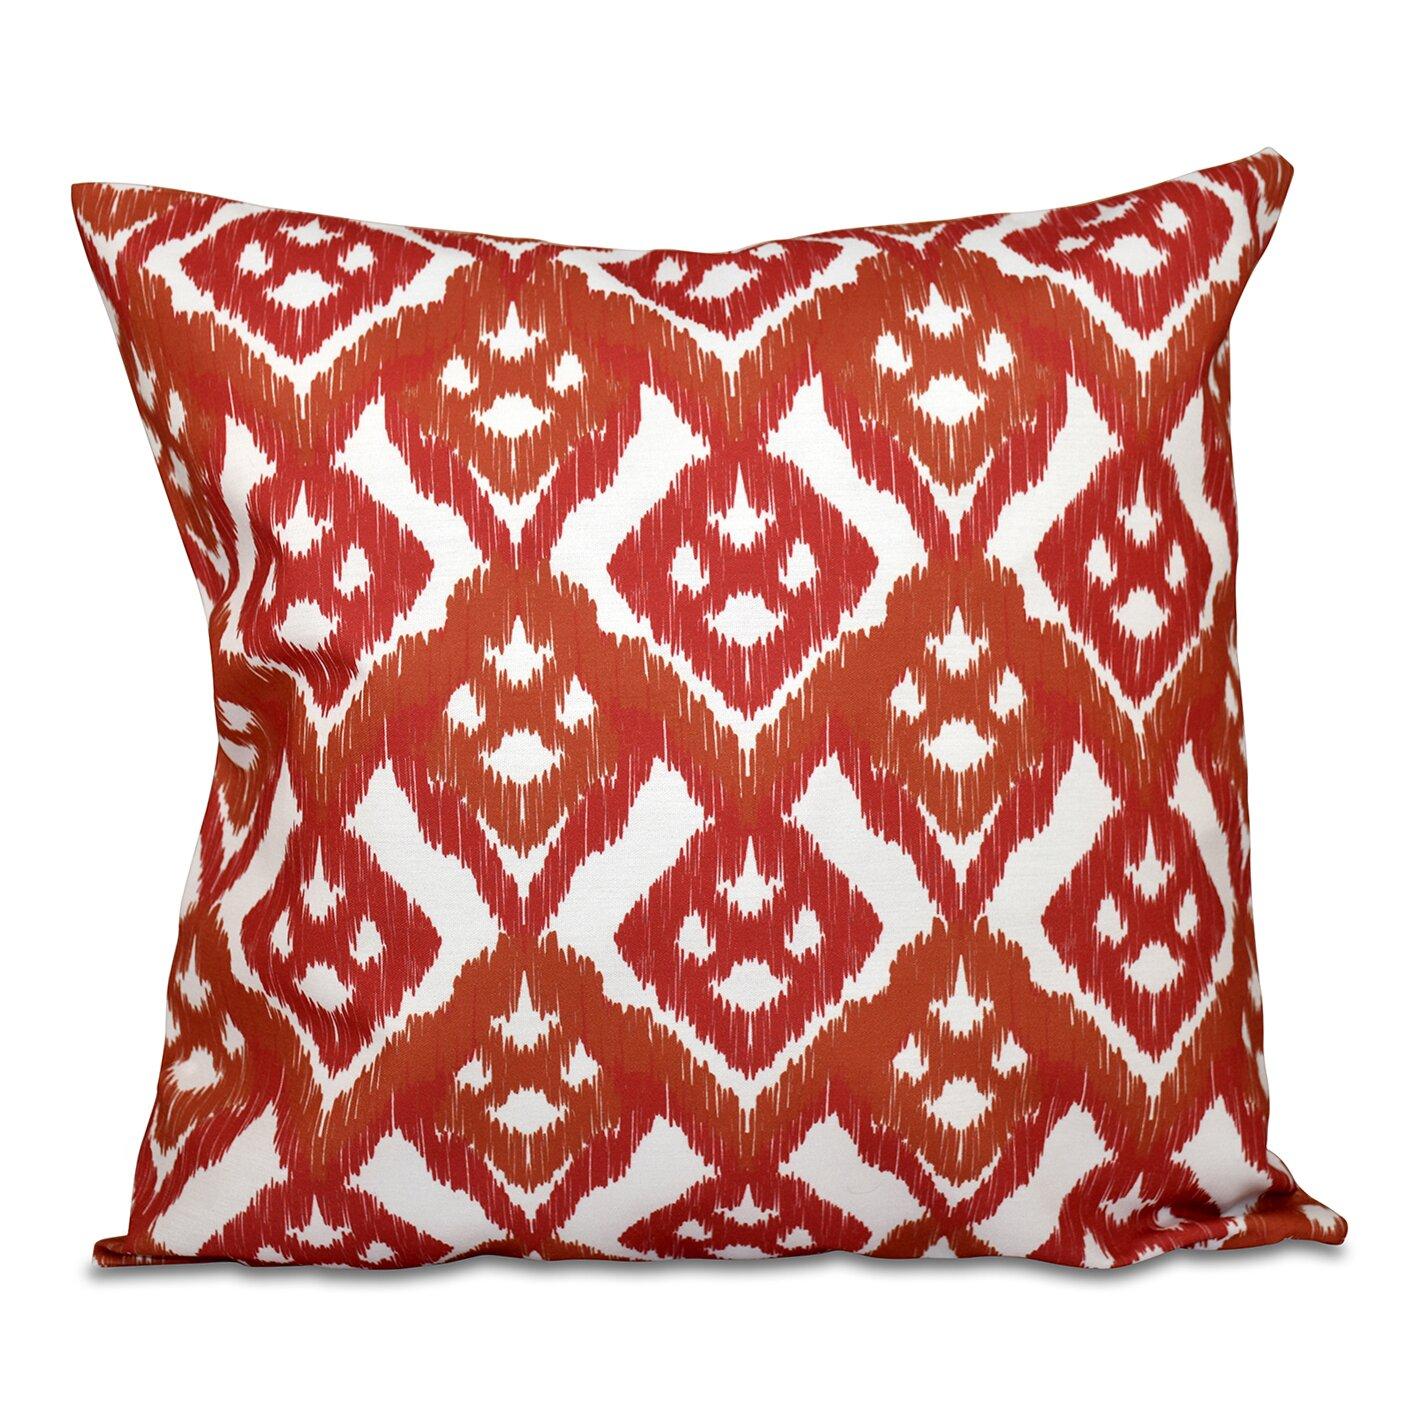 Throw Pillows Hipster : Bungalow Rose Oliver Hipster Geometric Print Throw Pillow & Reviews Wayfair